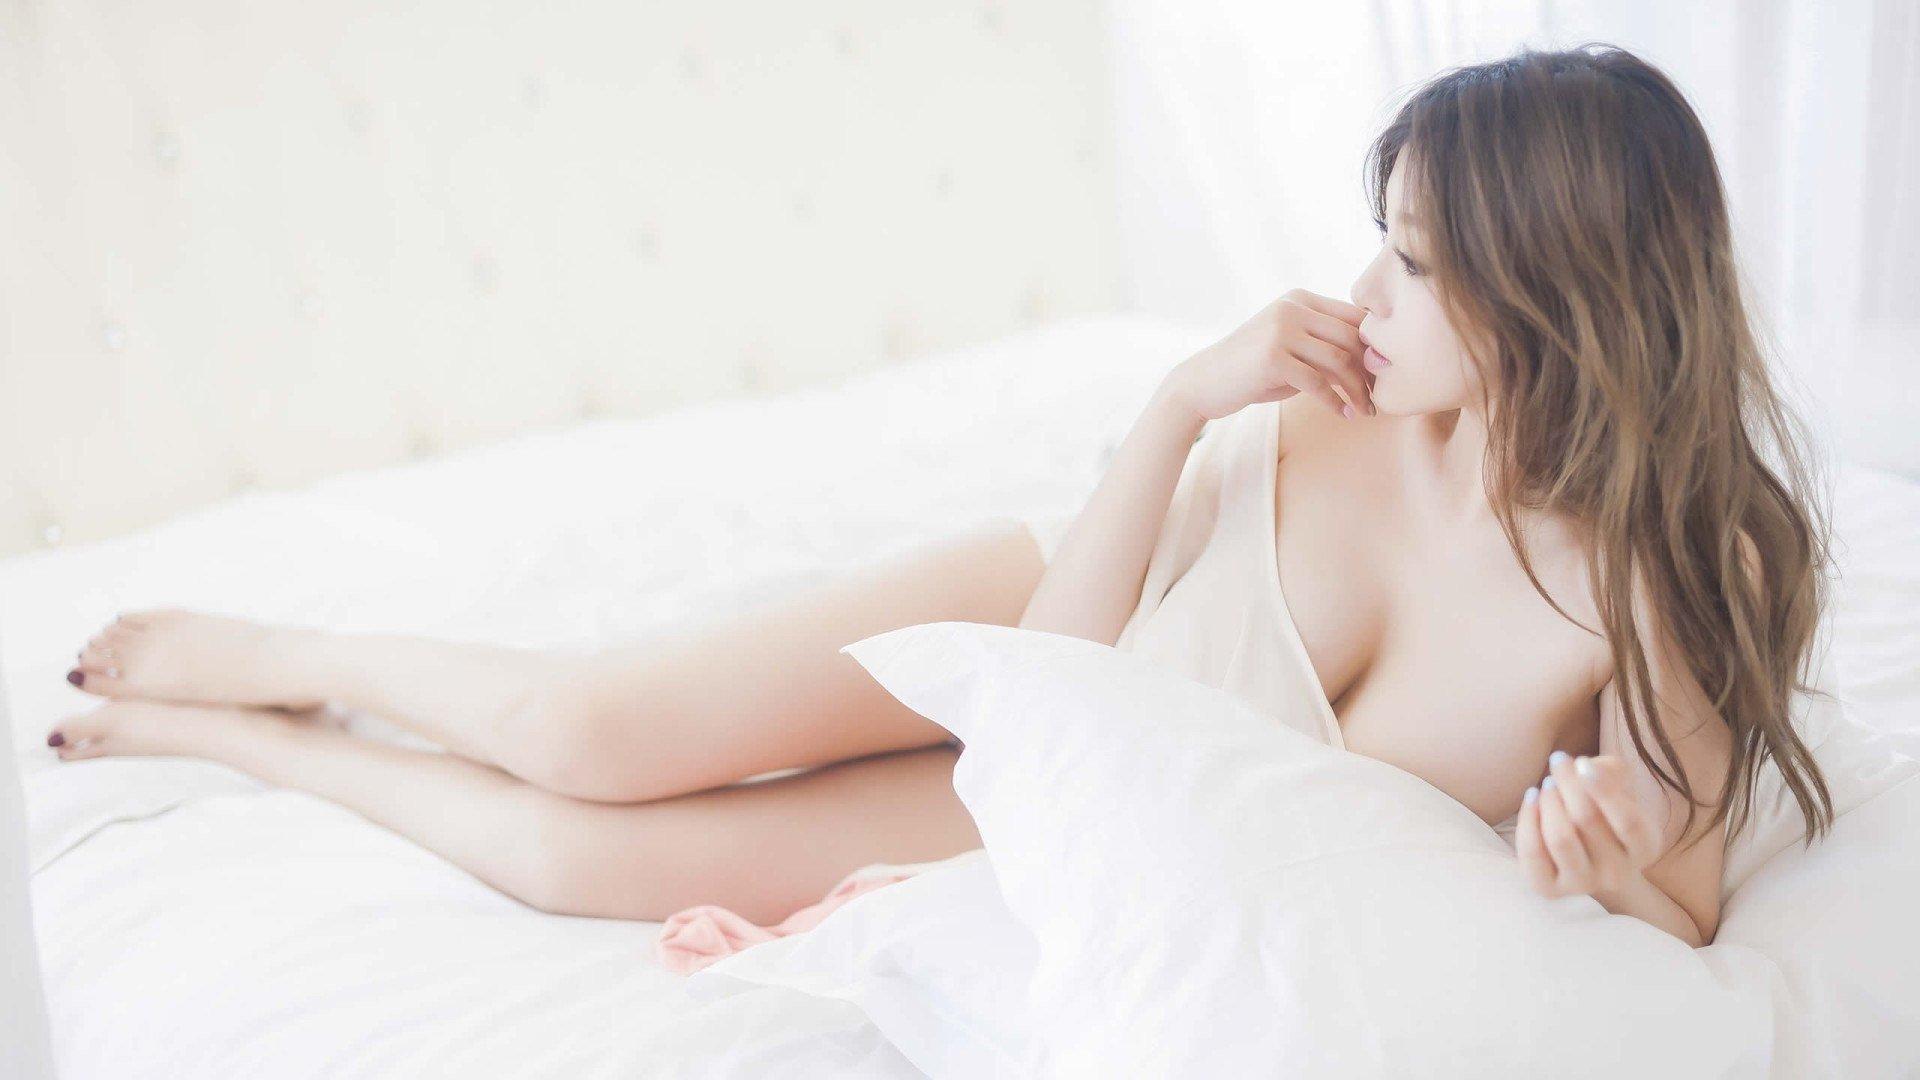 Chinese Webcam Girls — Kinkier Than They Seem